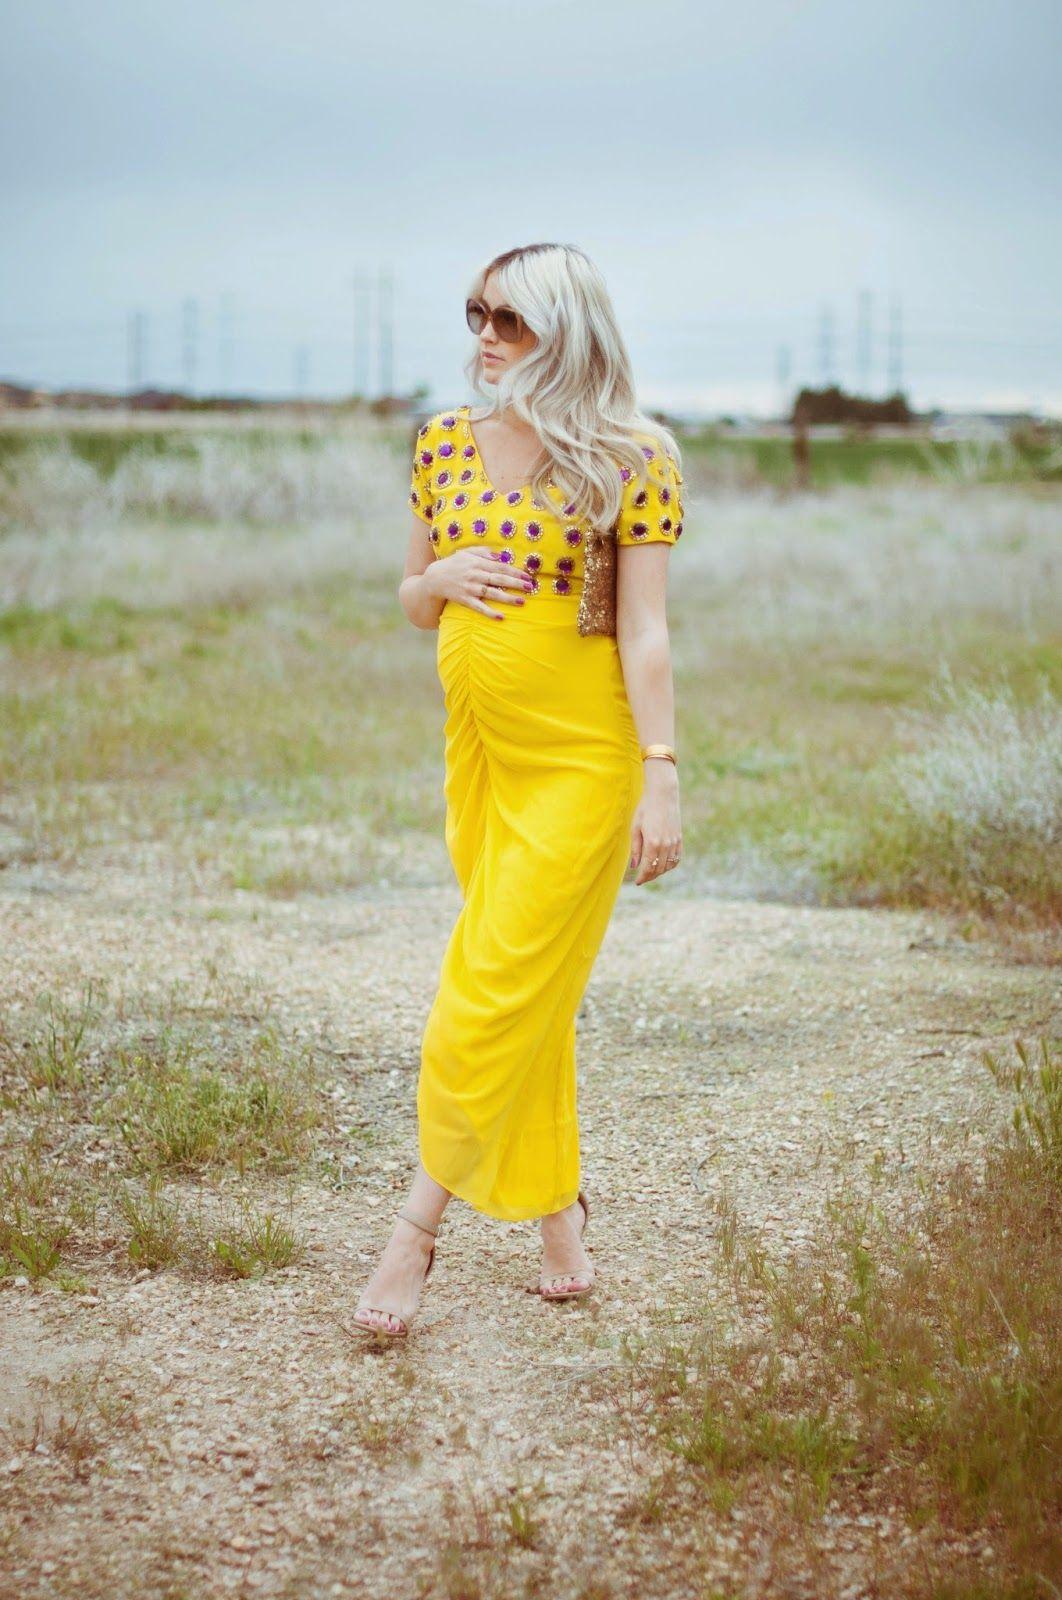 Dress - Virgo's Lounge | Shoes - Windsor | Bracelet - Coordinates Collection, Shop Pirya | Sunglasses - Valentino